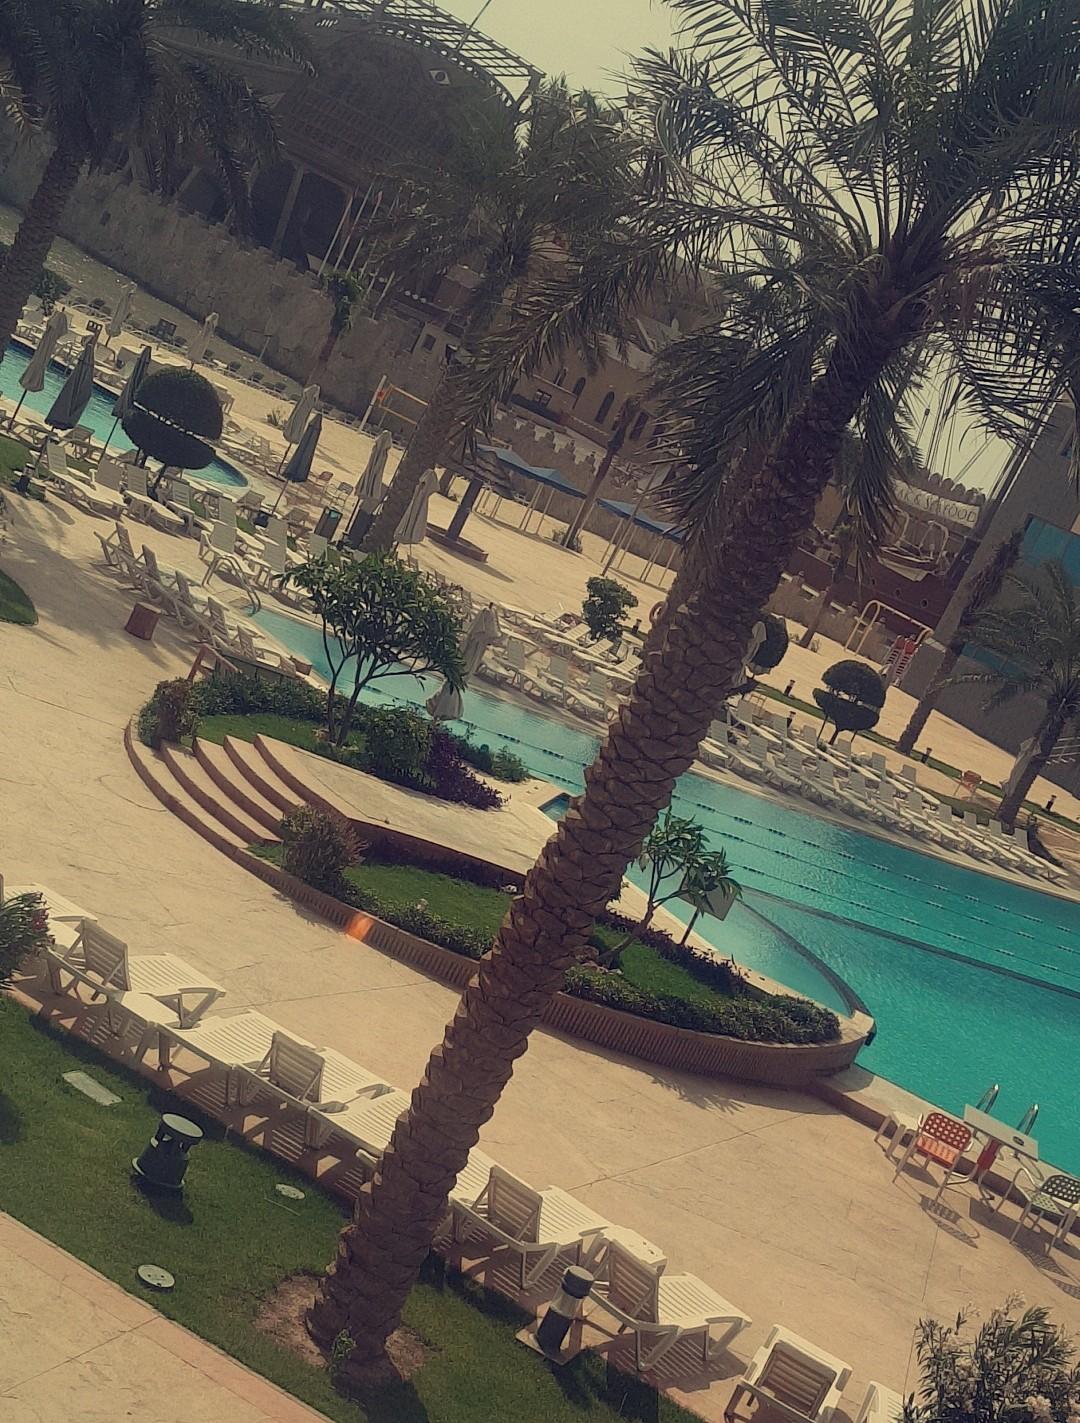 #palms_beach_hotel @ The palms beach hotel and spa - الكويت